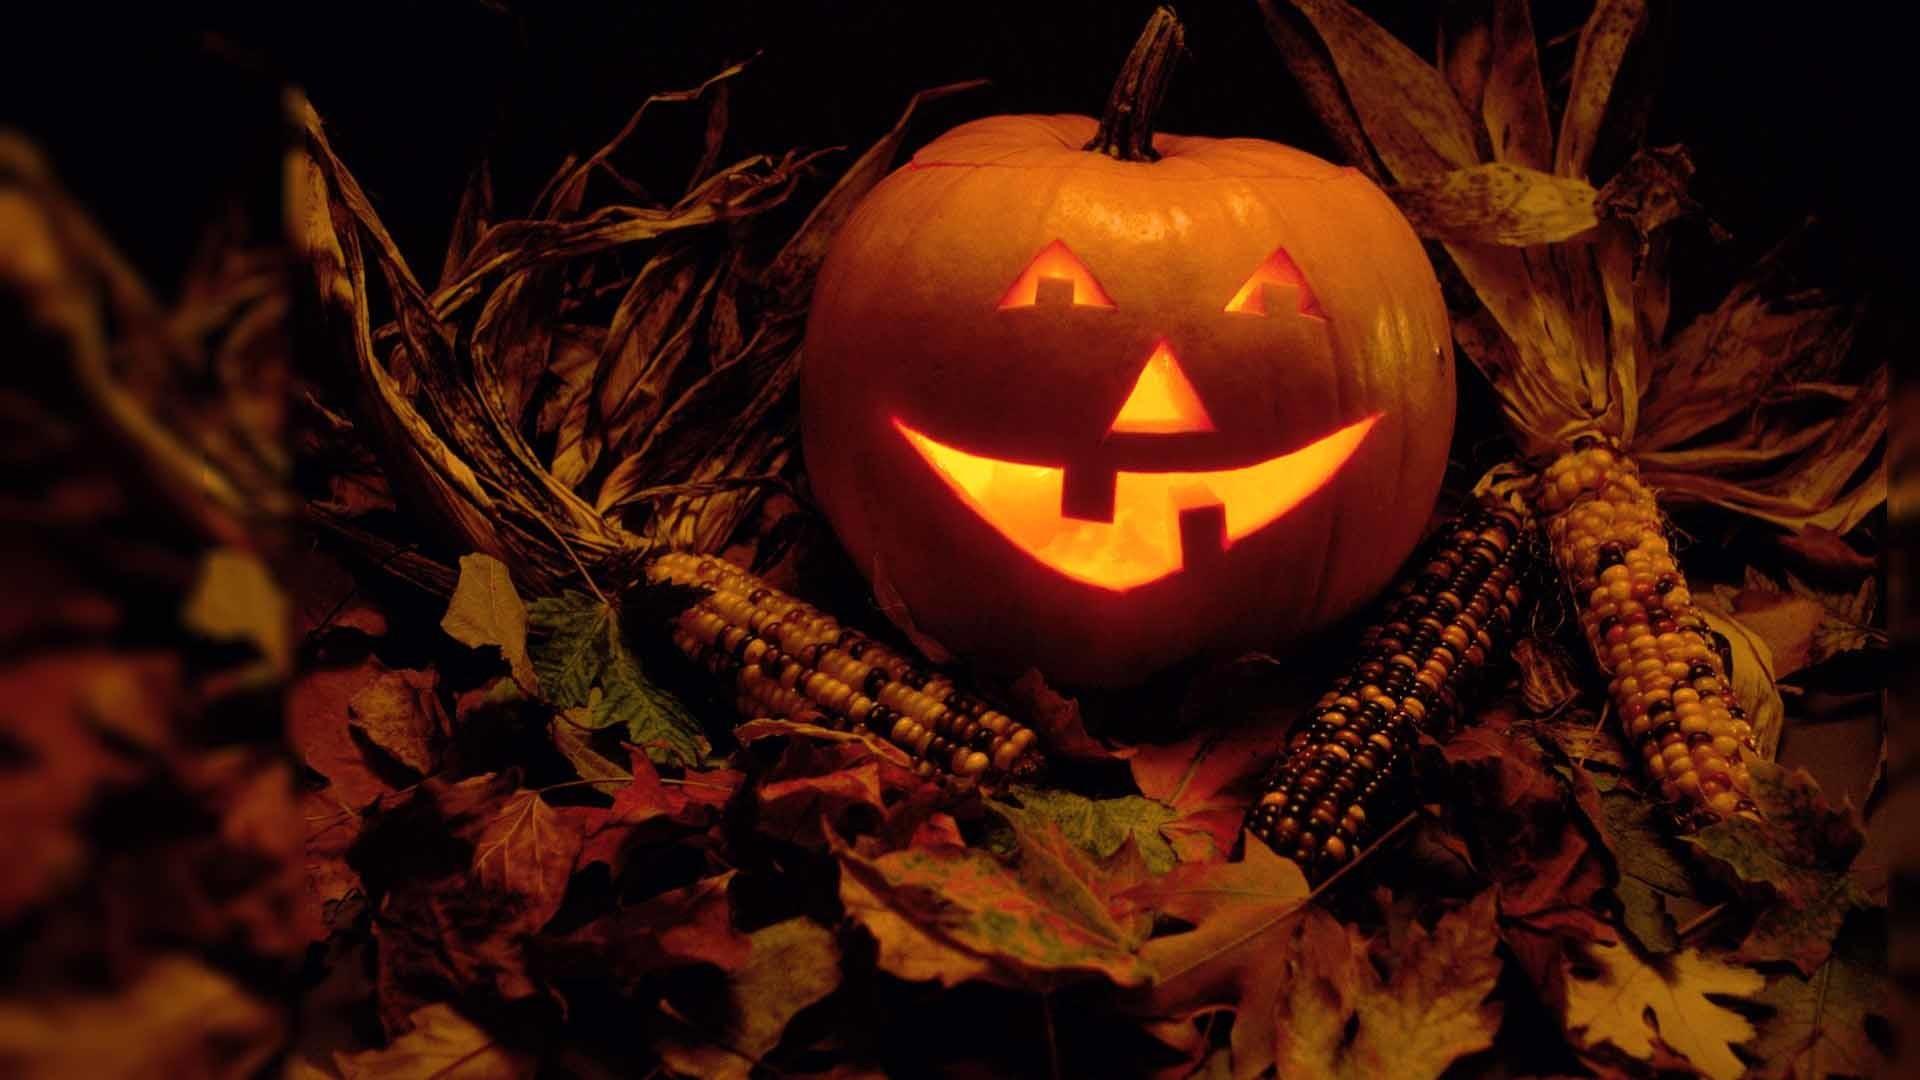 Res: 1920x1080, Laughing Pumpkin On Halloween Wallpaper